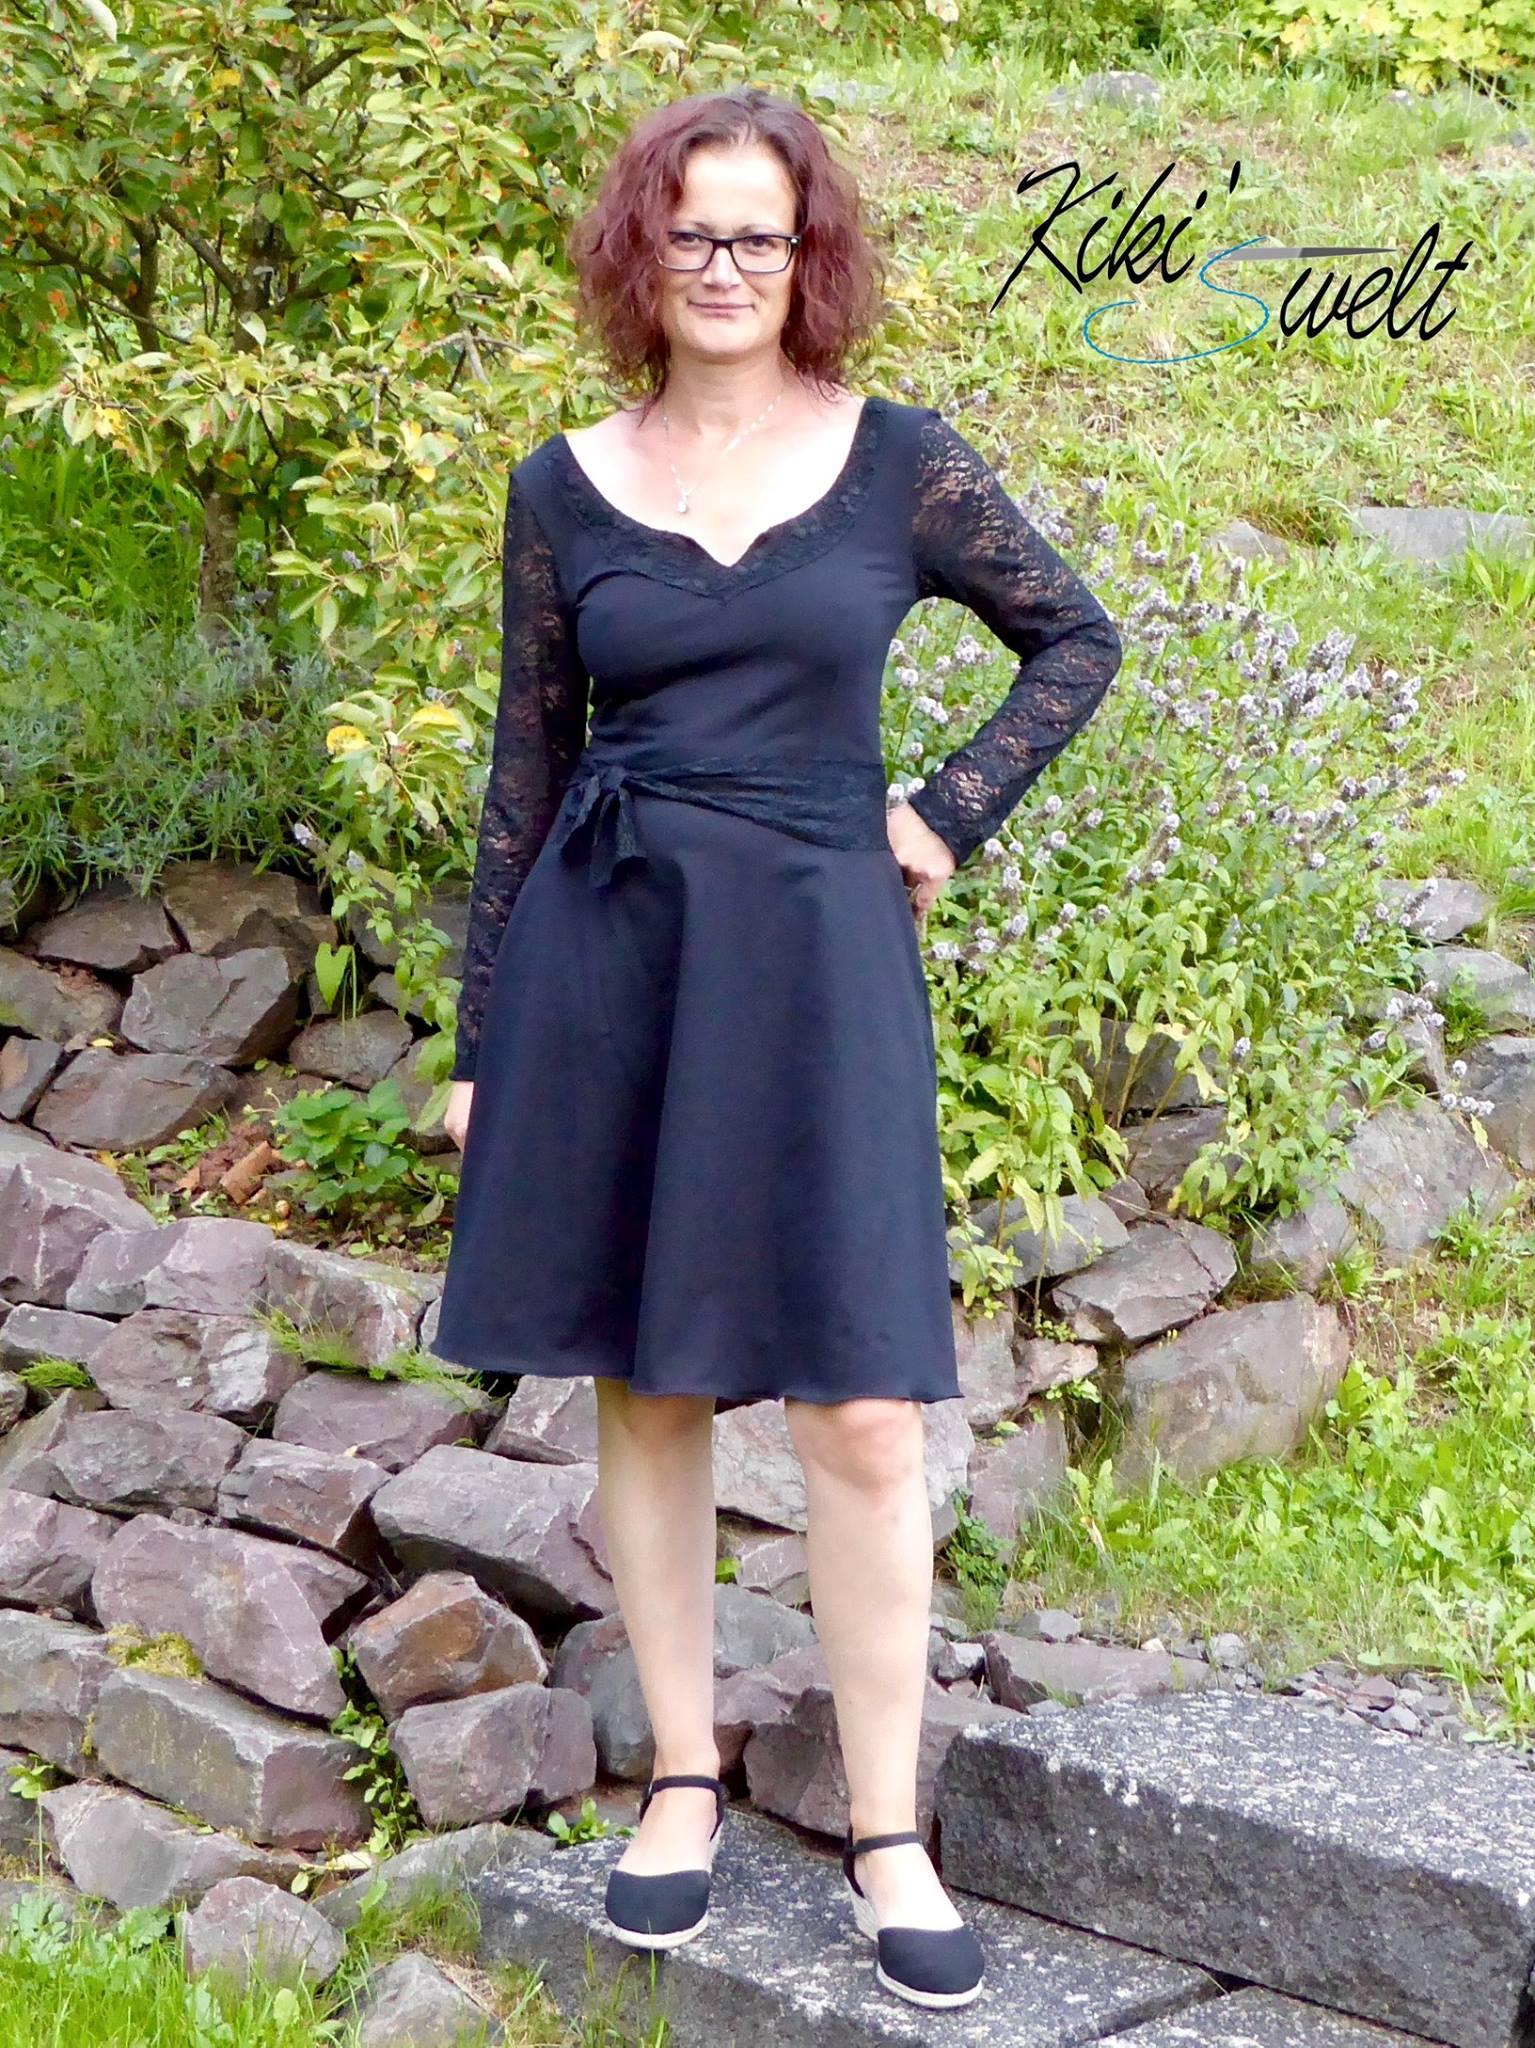 Nuria-Jerseykleid-farbenmix-bienvenido-colorido_Ebook-Kleid_Schnittmuster-Damenkleid_100